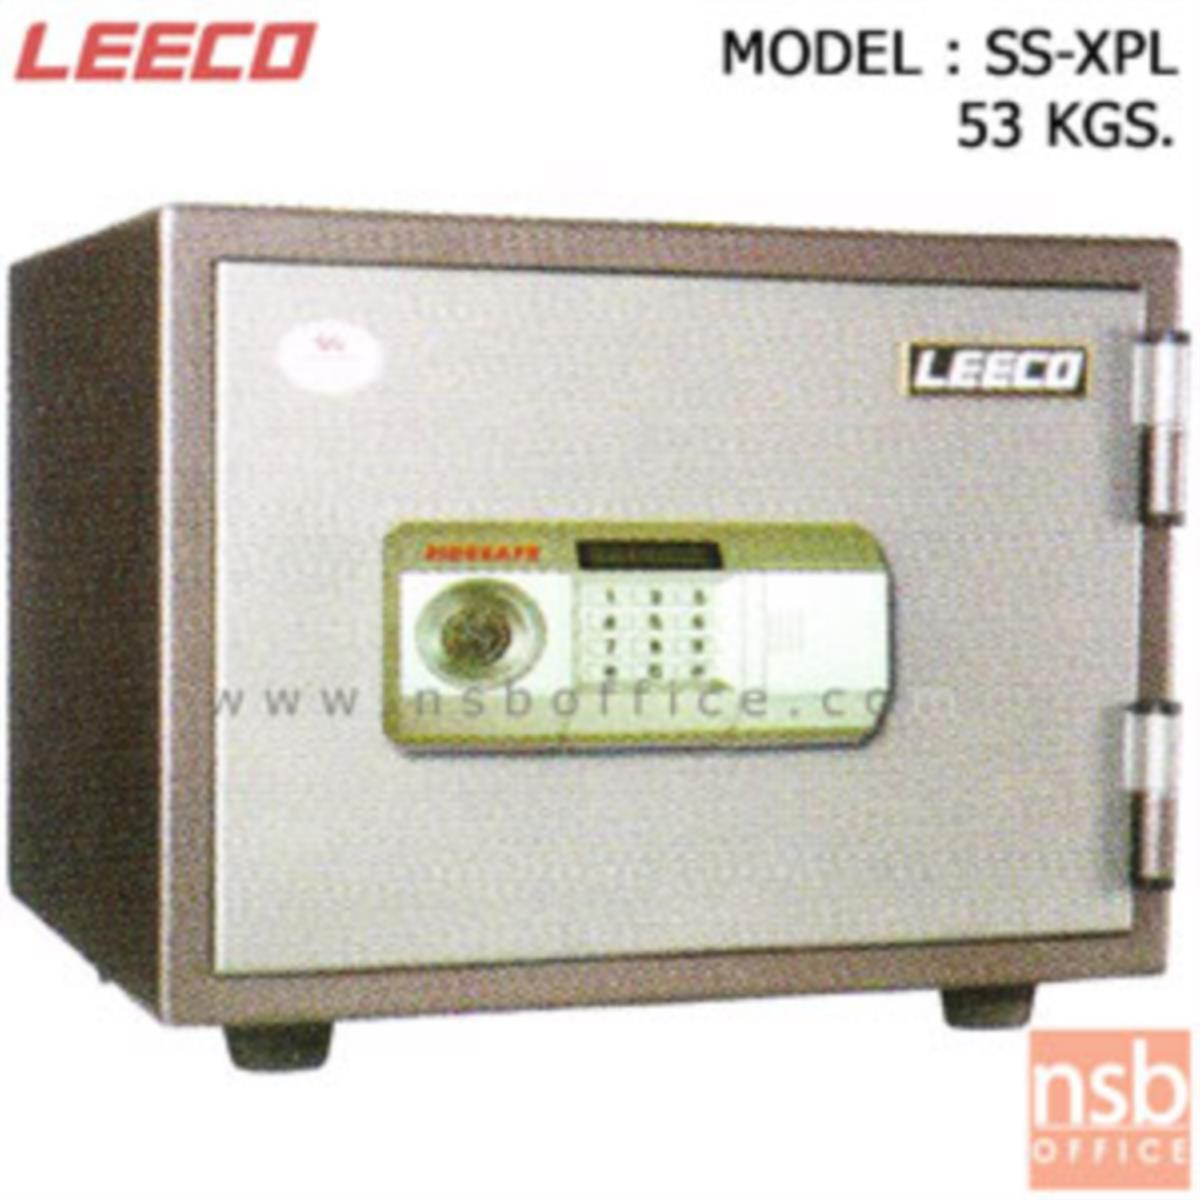 F03A002:ตู้เซฟดิจิตอล 53 กก. (1 รหัสกด / 1 ปุ่มหมุนบิด) LEECO SS-XPL